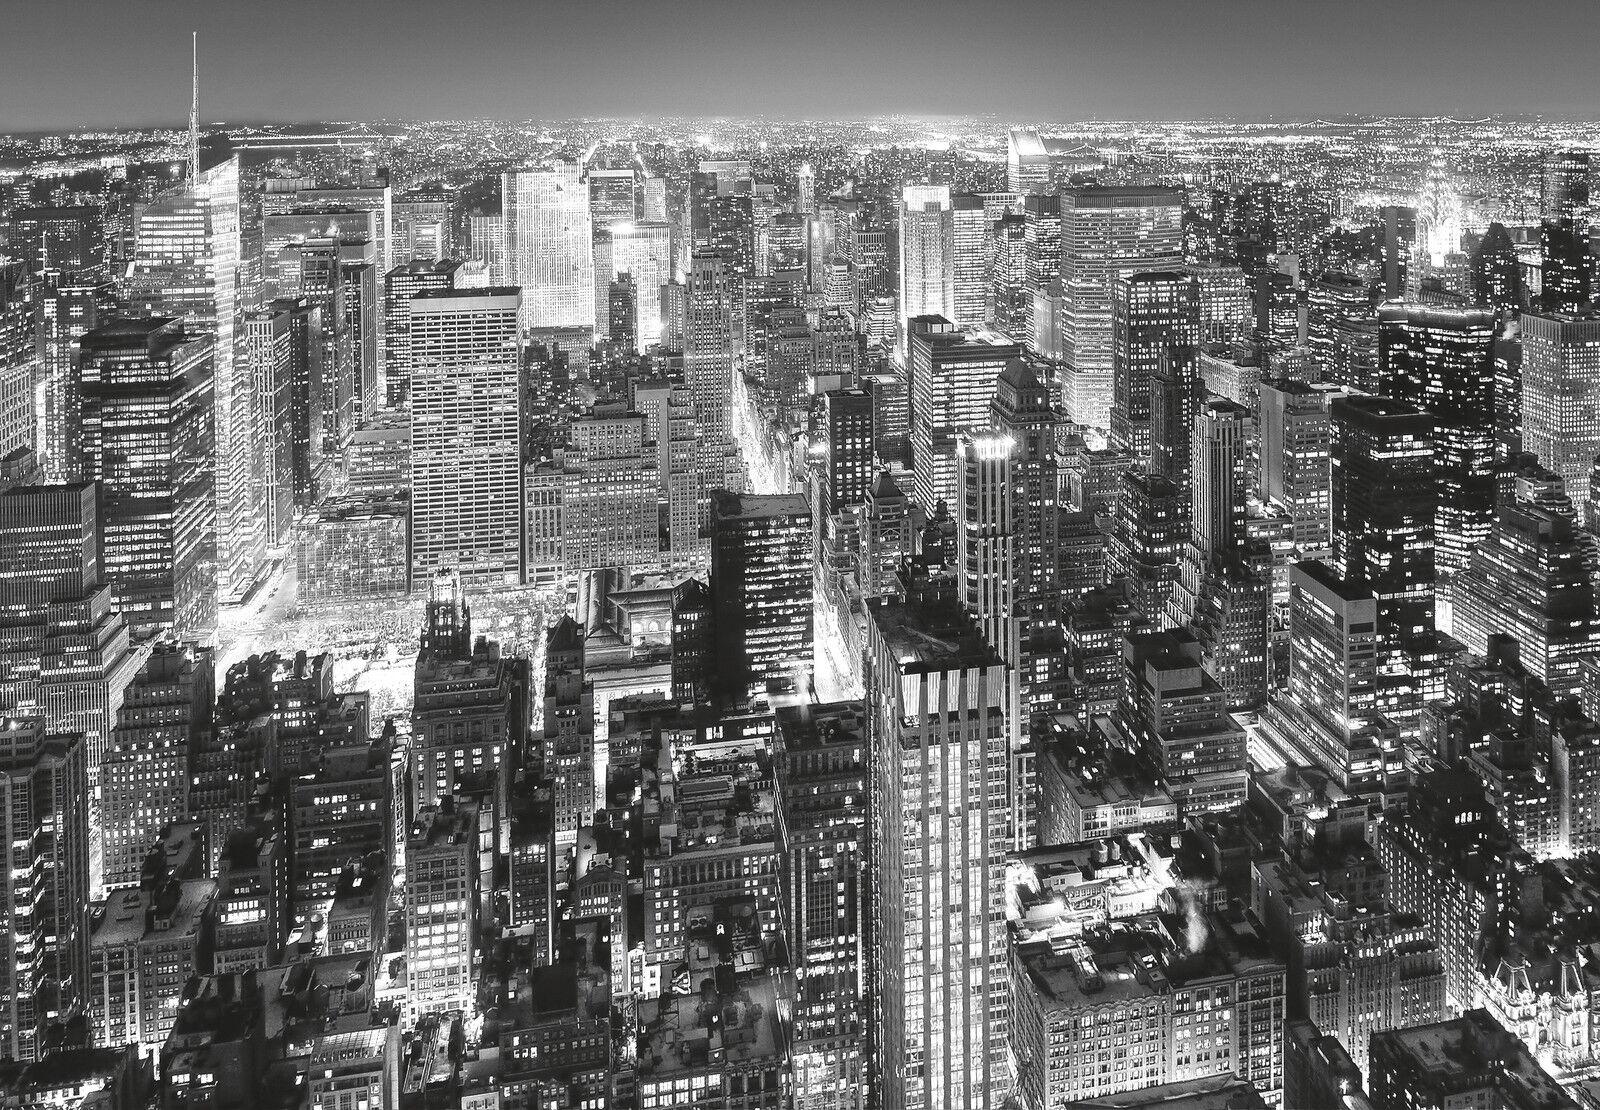 Fototapete- NEW YORK- (141i)-366x254cm-Manhattan Skyscrapes Skyline-mit Kleister